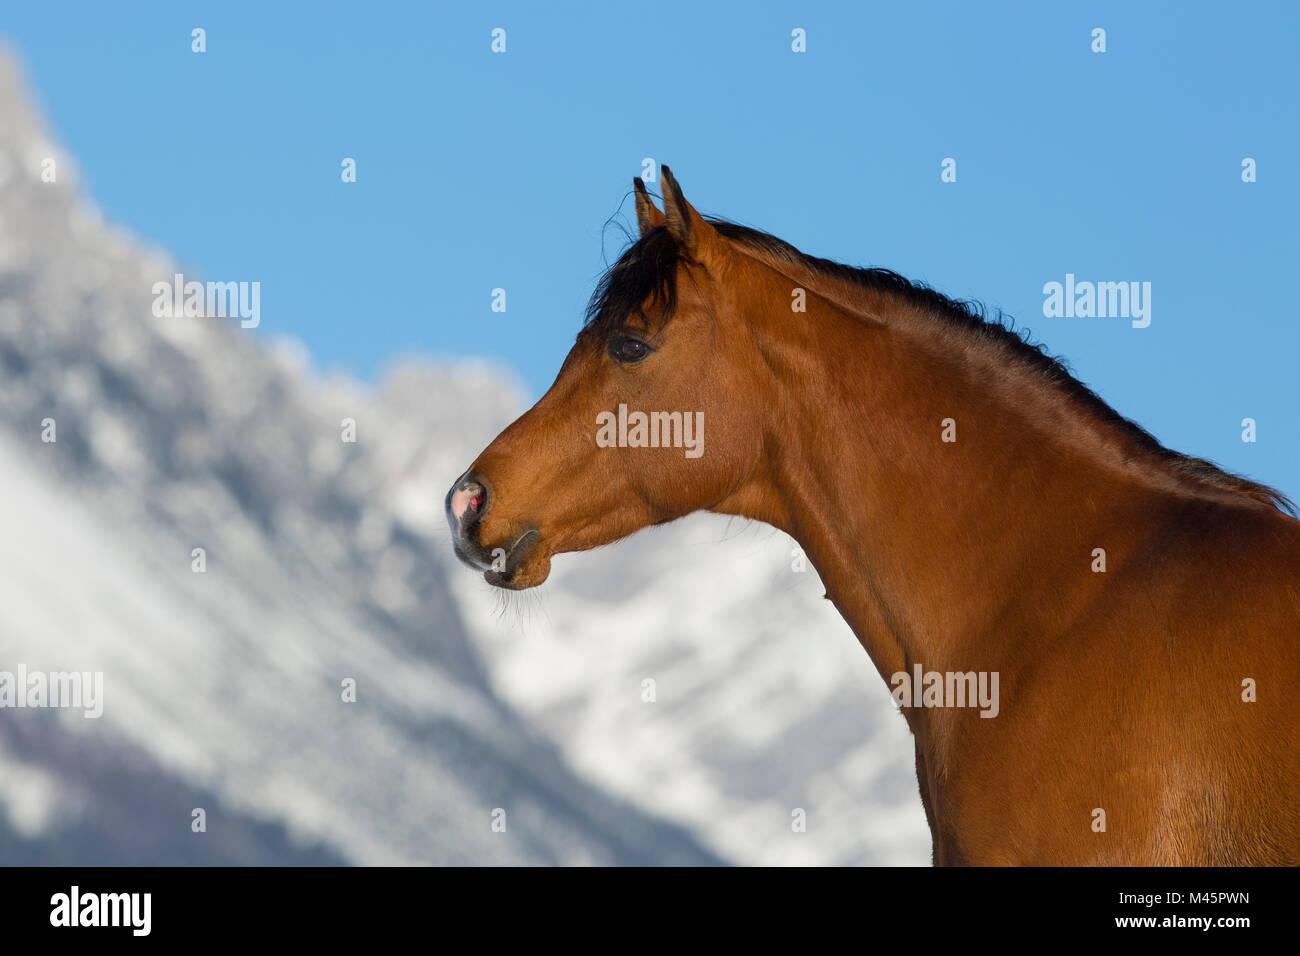 Arabian horse,stallion,animal portrait in winter landscape,Tyrol,Austria - Stock Image